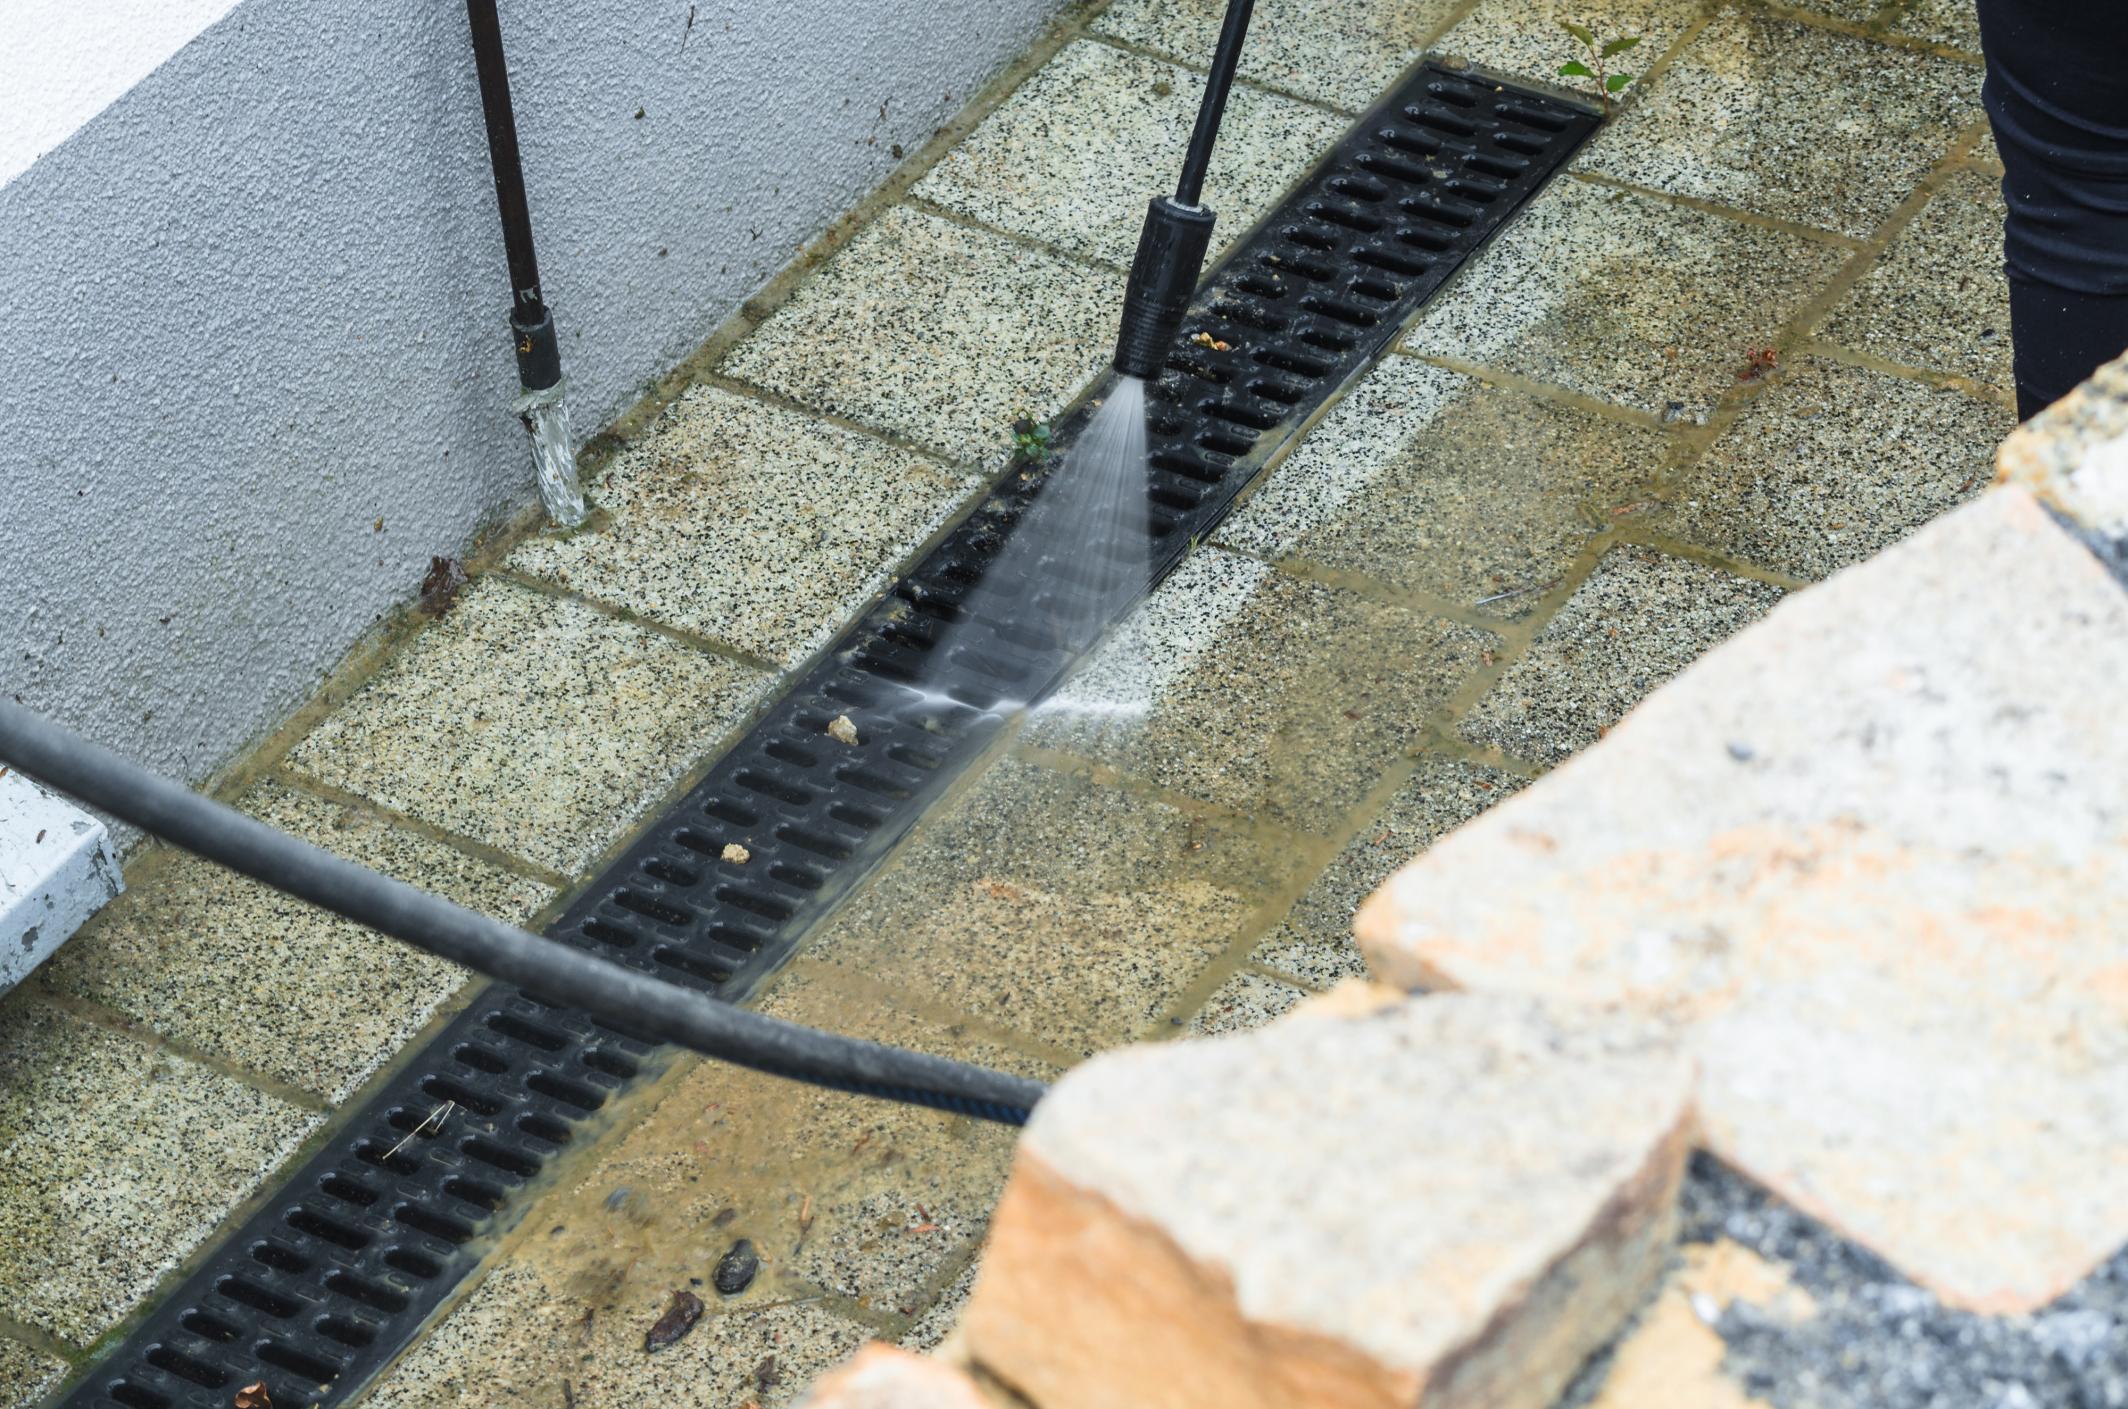 pressure washer spraying the drainage